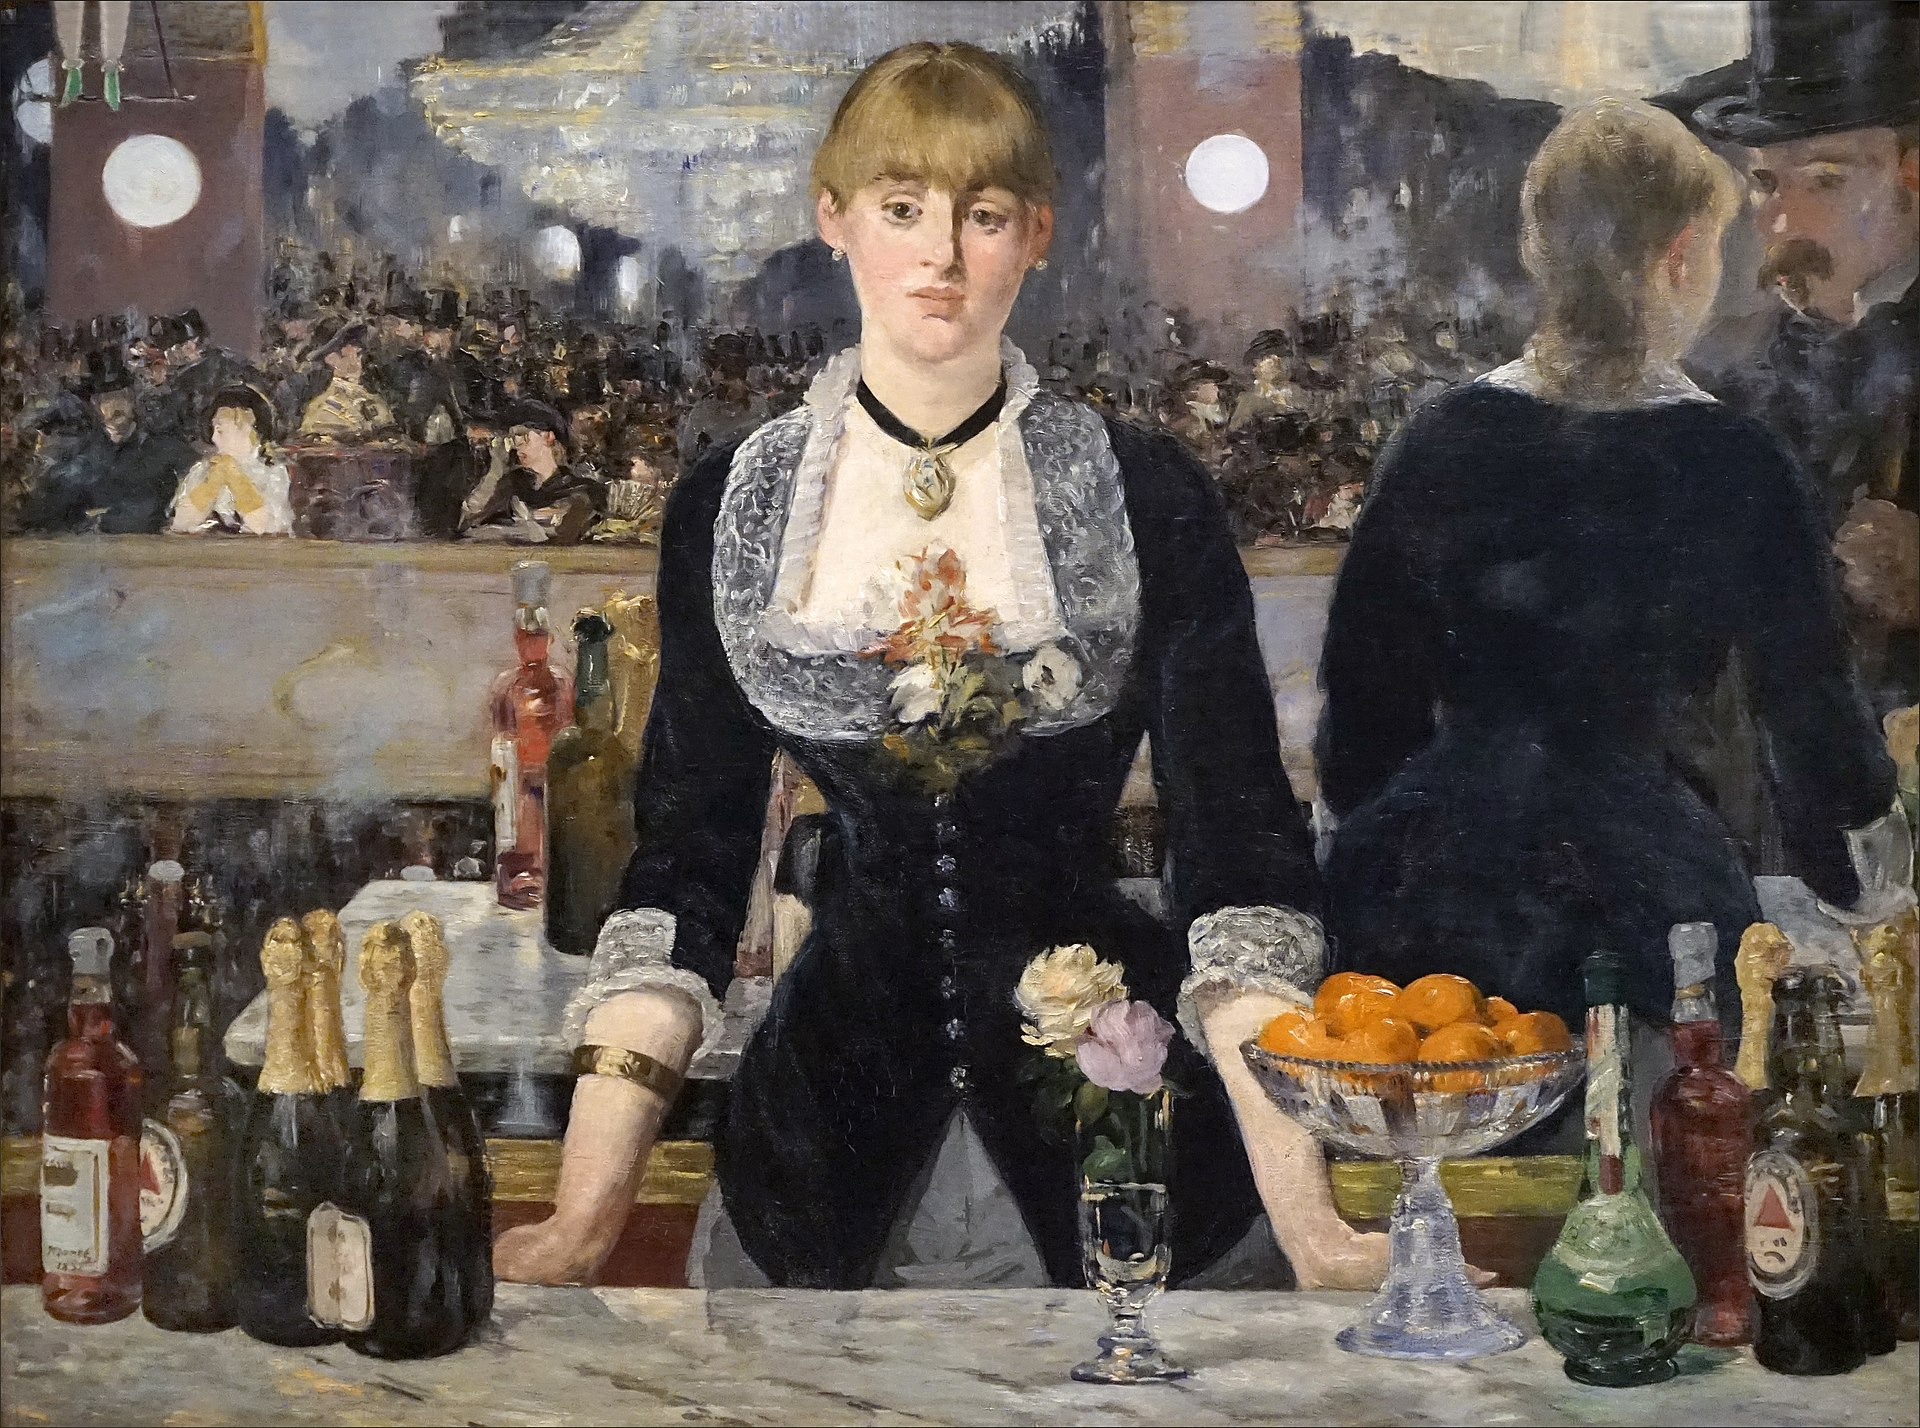 Édouard Manet, A Bar at the Folies-Bergèr, 1882.